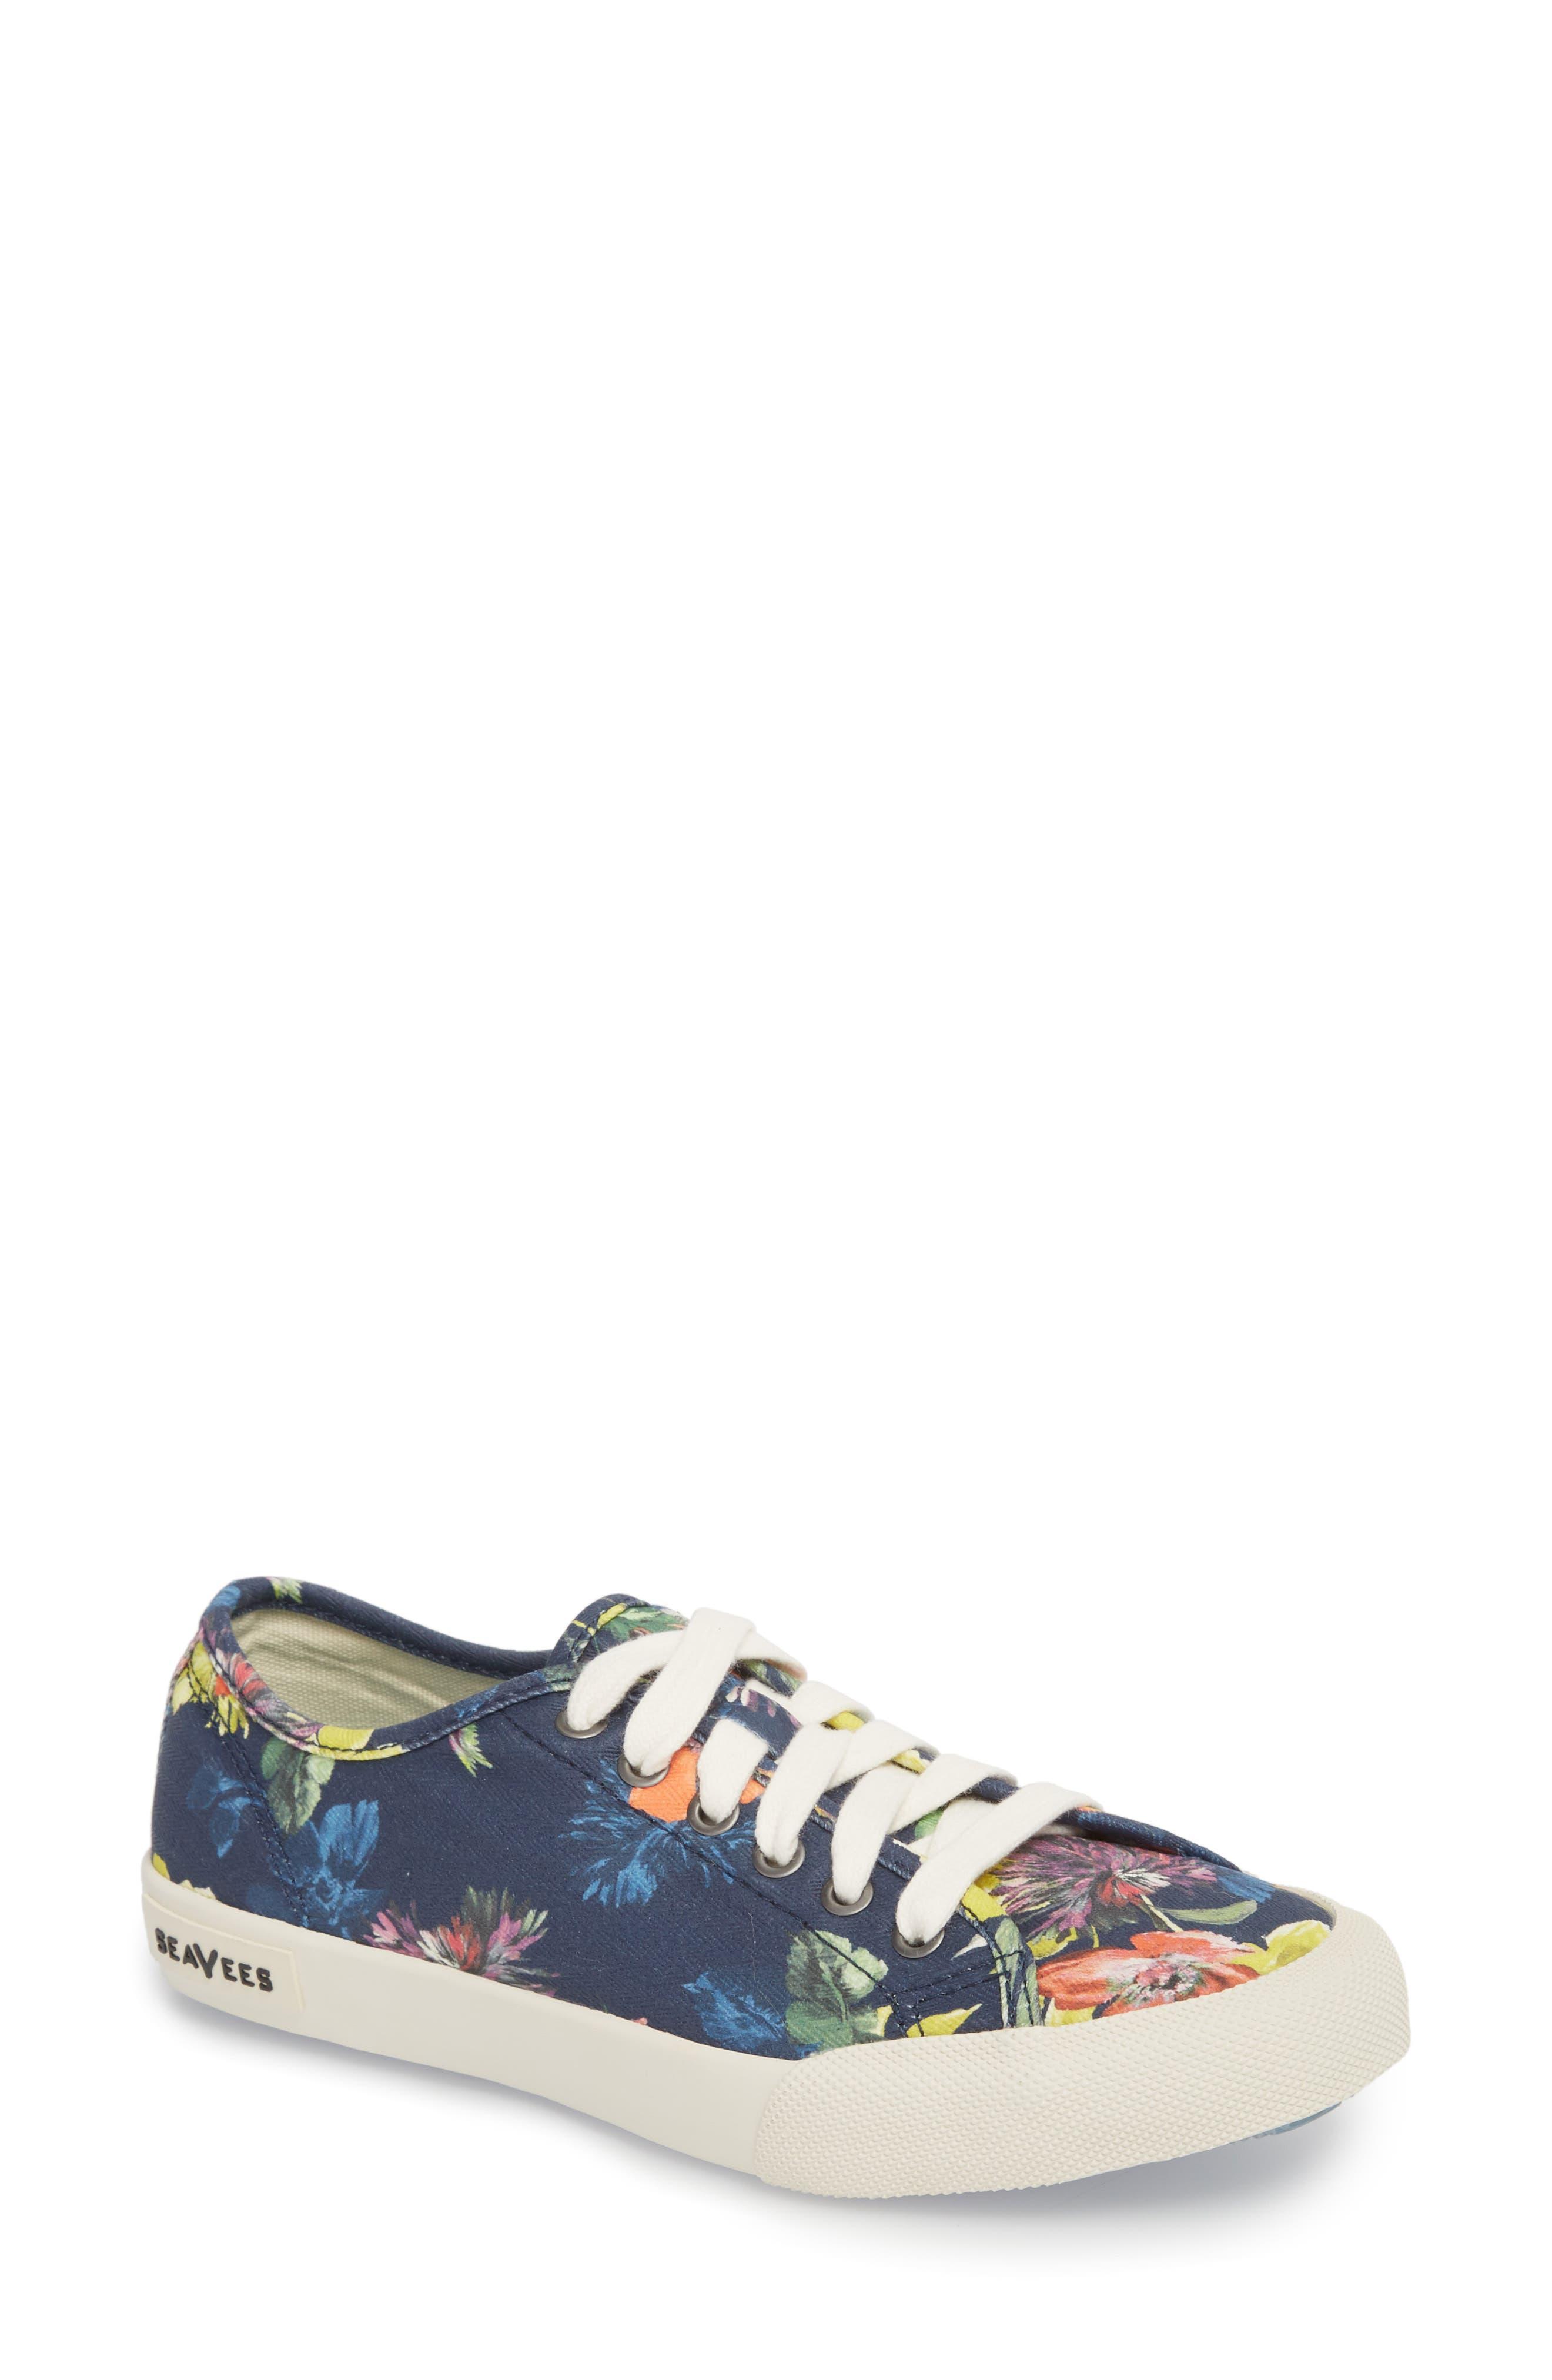 x Trina Turk Monterey Sneaker,                         Main,                         color, Navy Chrysanthemum